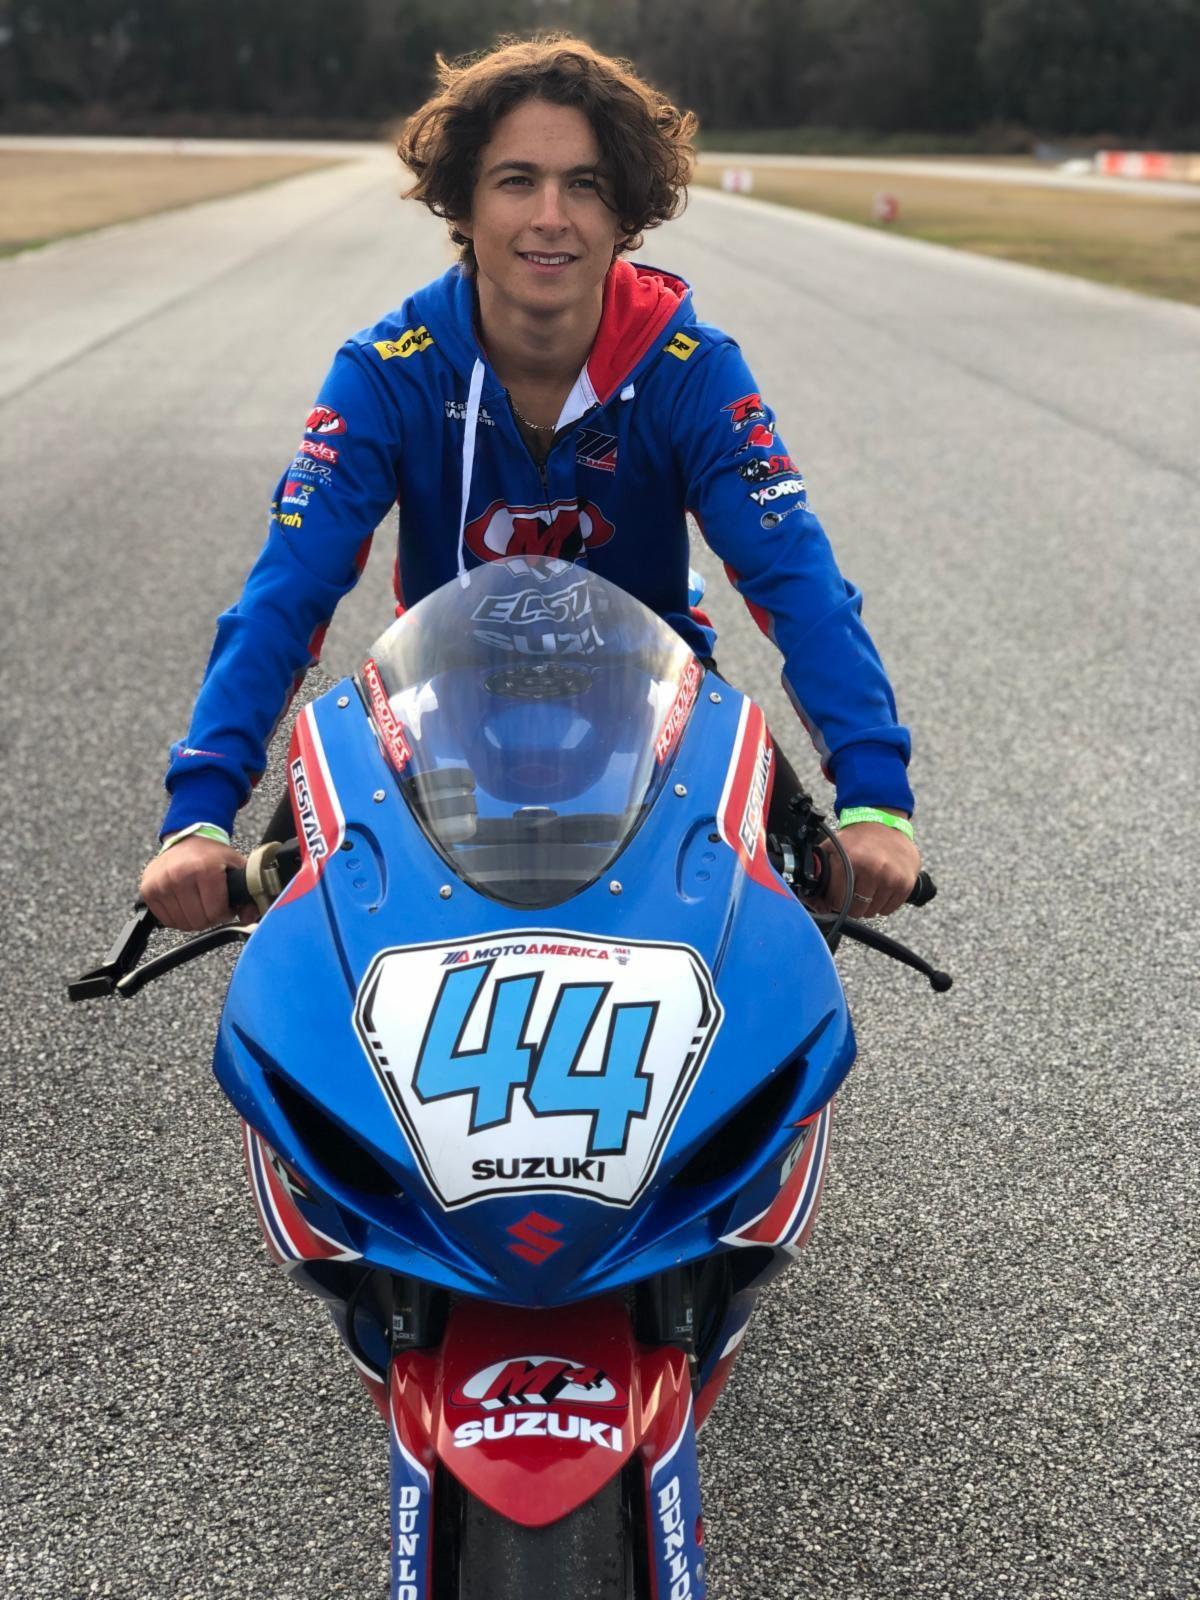 210323 18-Year Old Sam Lochoff moves up to Supersport for Team M4 ECSTAR Suzuki in 2021